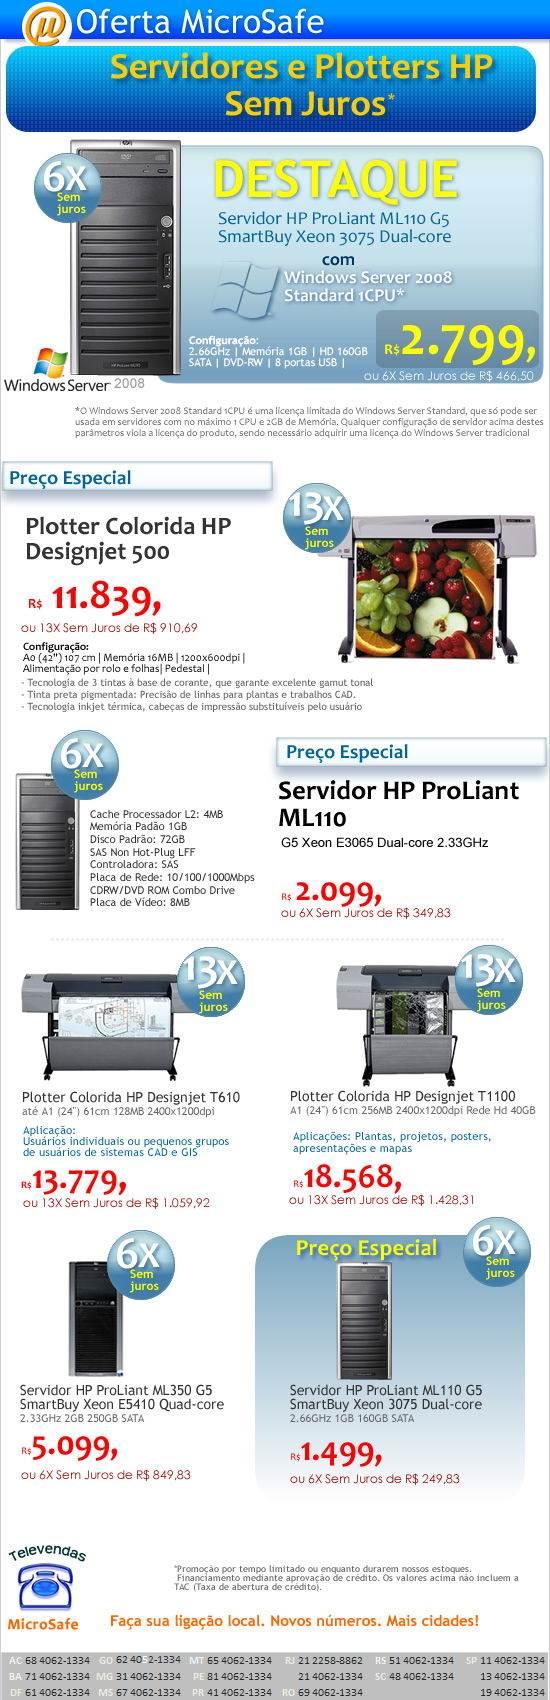 servidores e Plotters HP Sem Juros